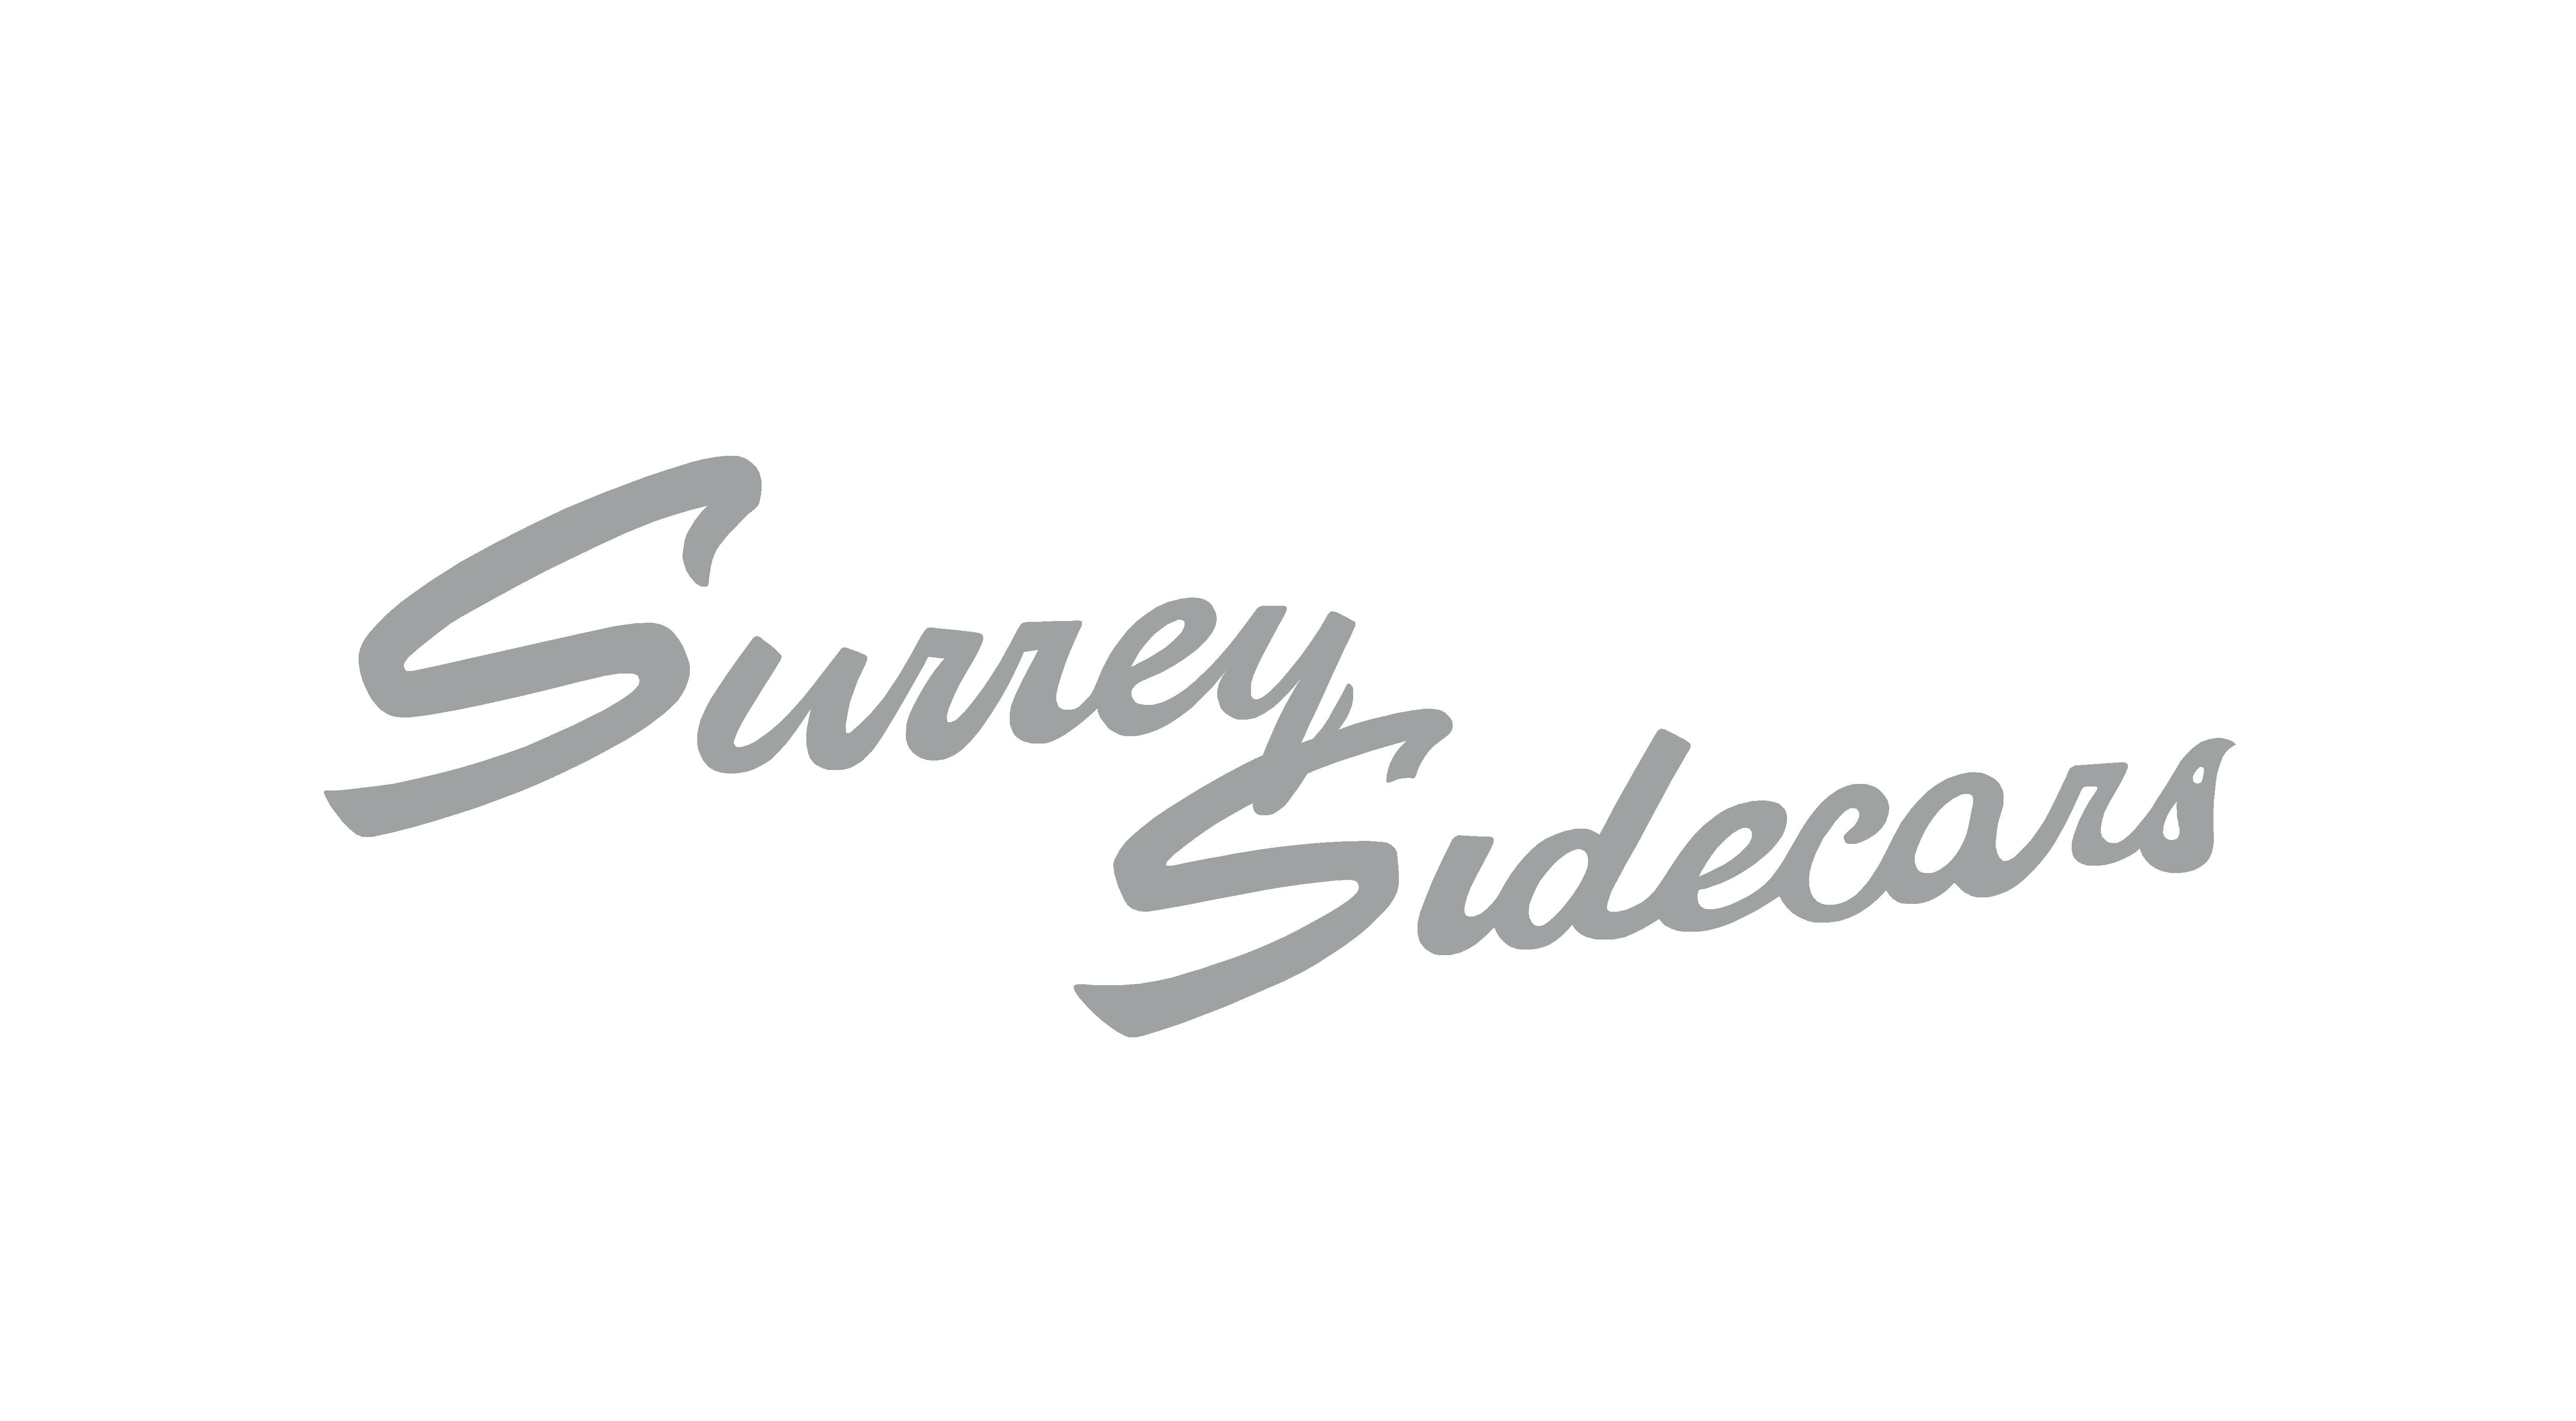 Surrey Sidecars